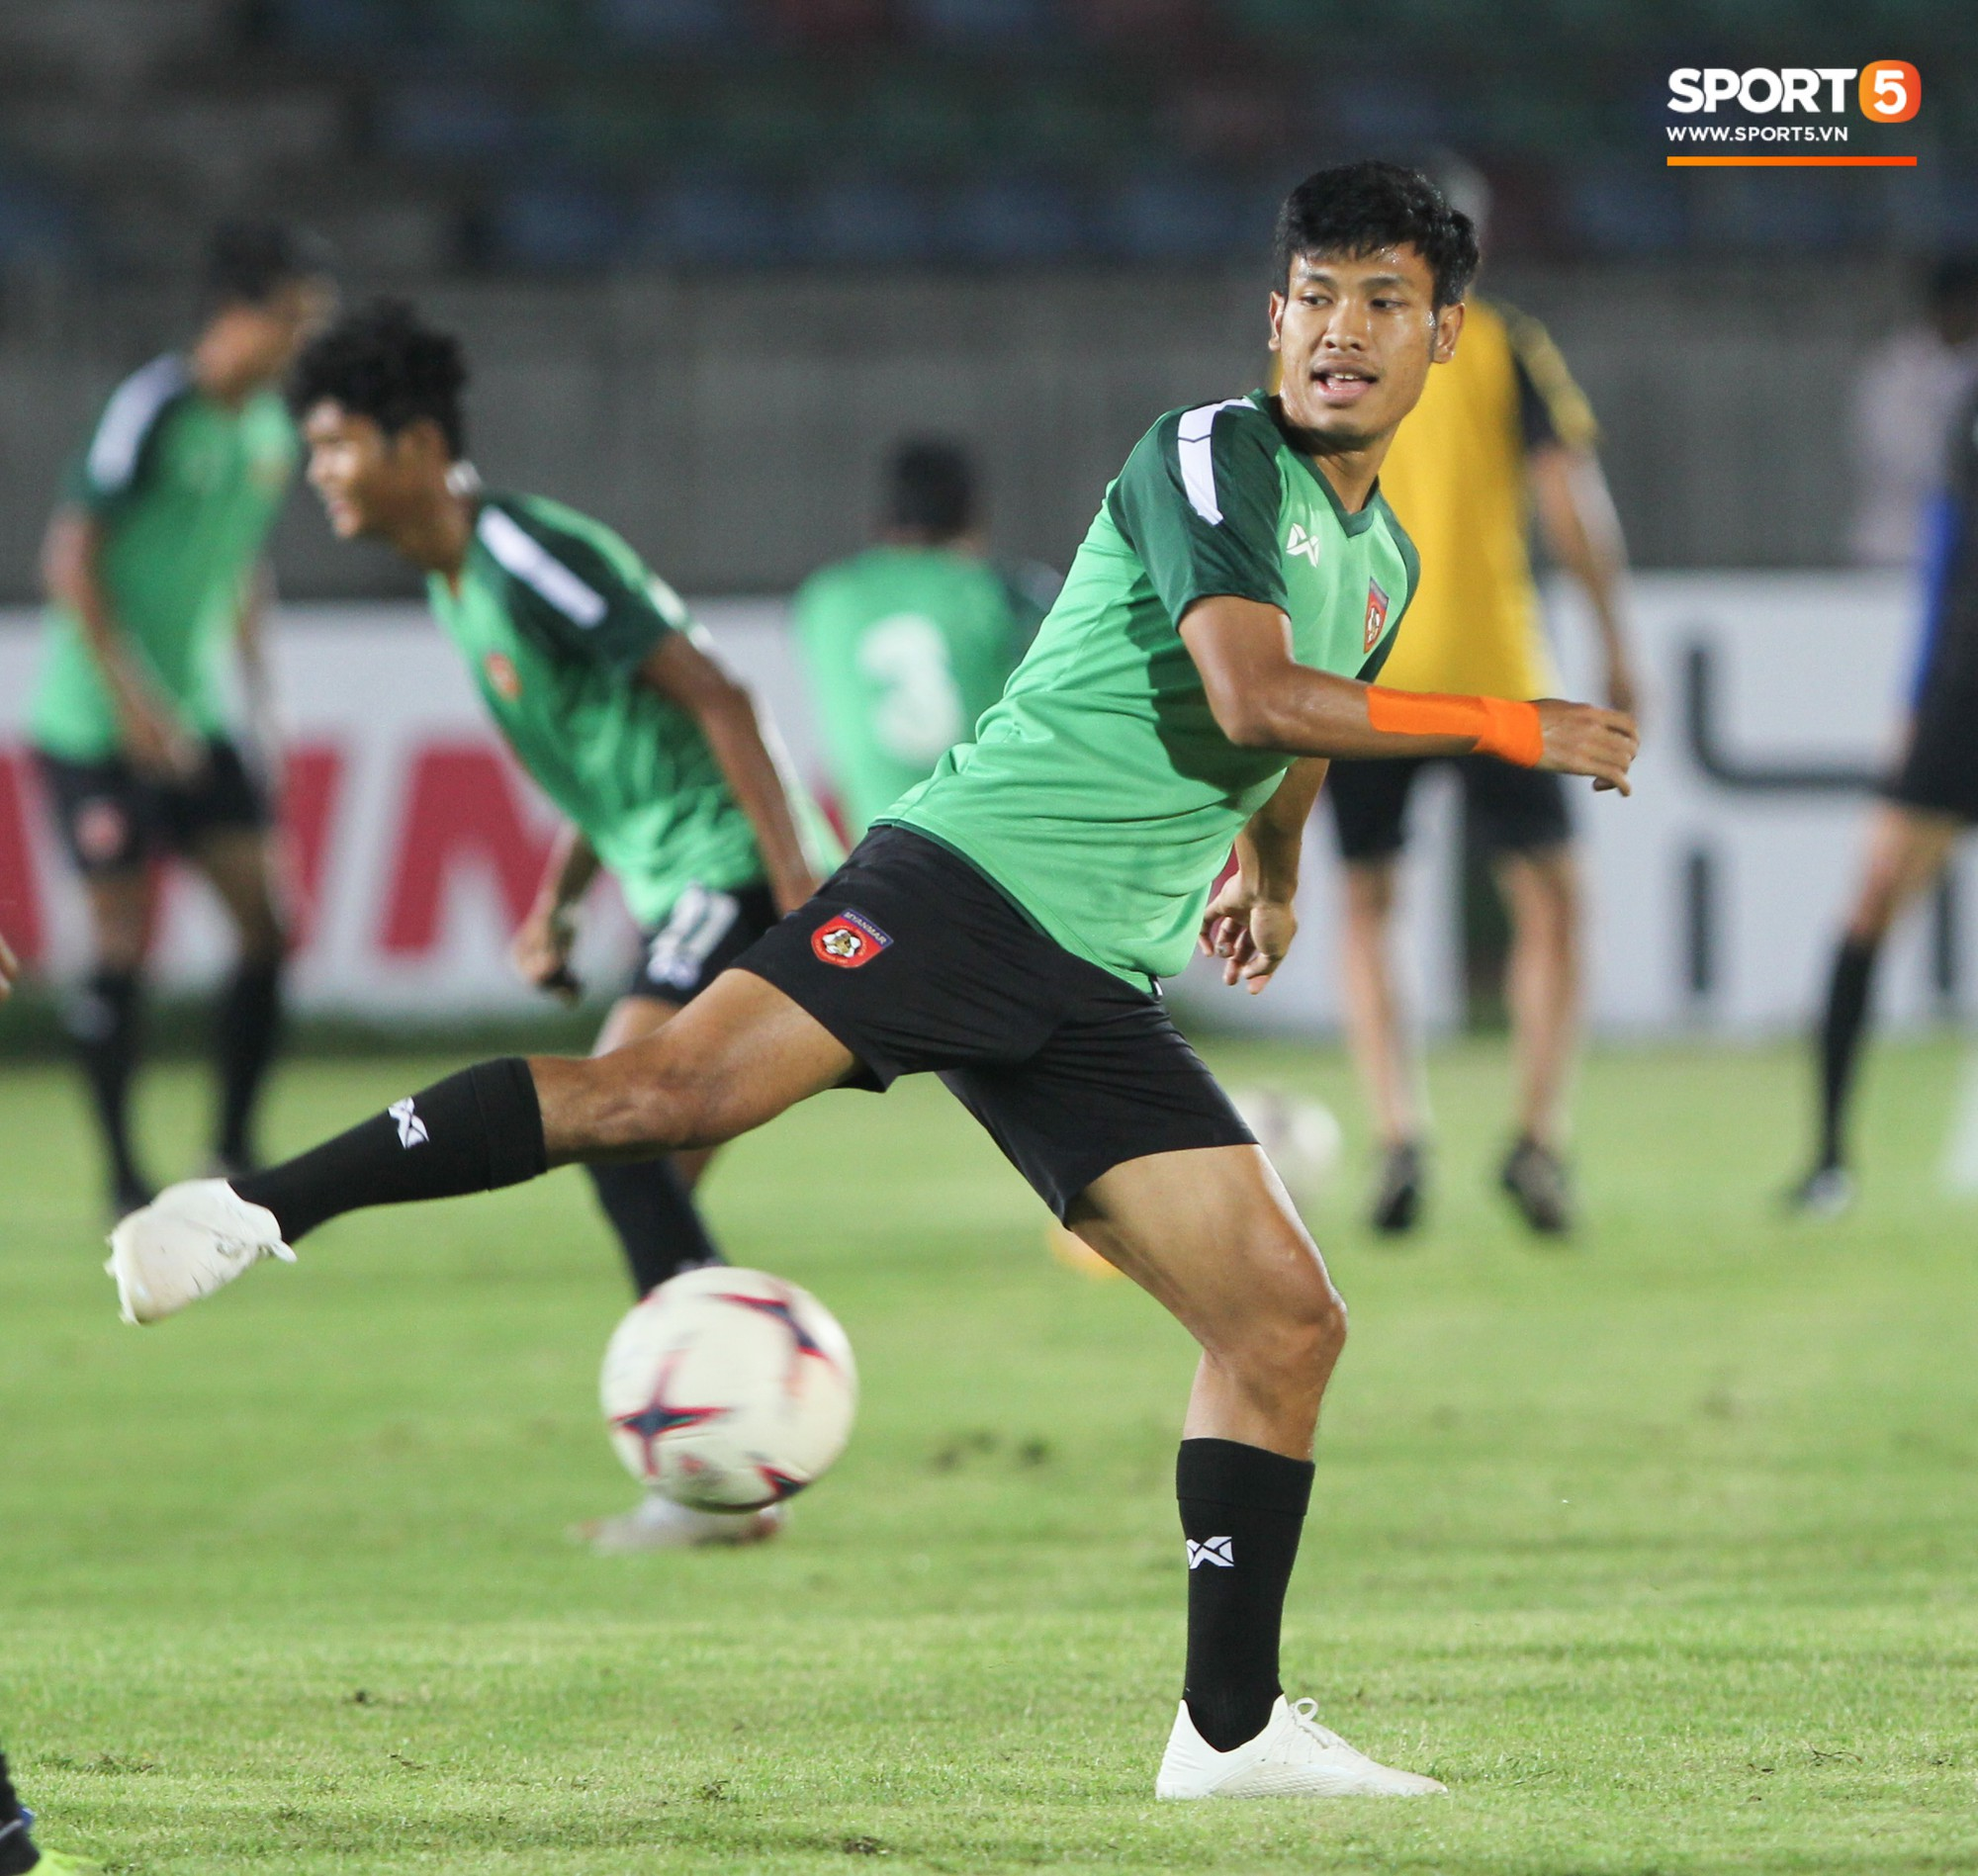 Myanmar Reporter: Vietnam 201 is a stronger Vietnam than Cup 2018 - Picture 3.